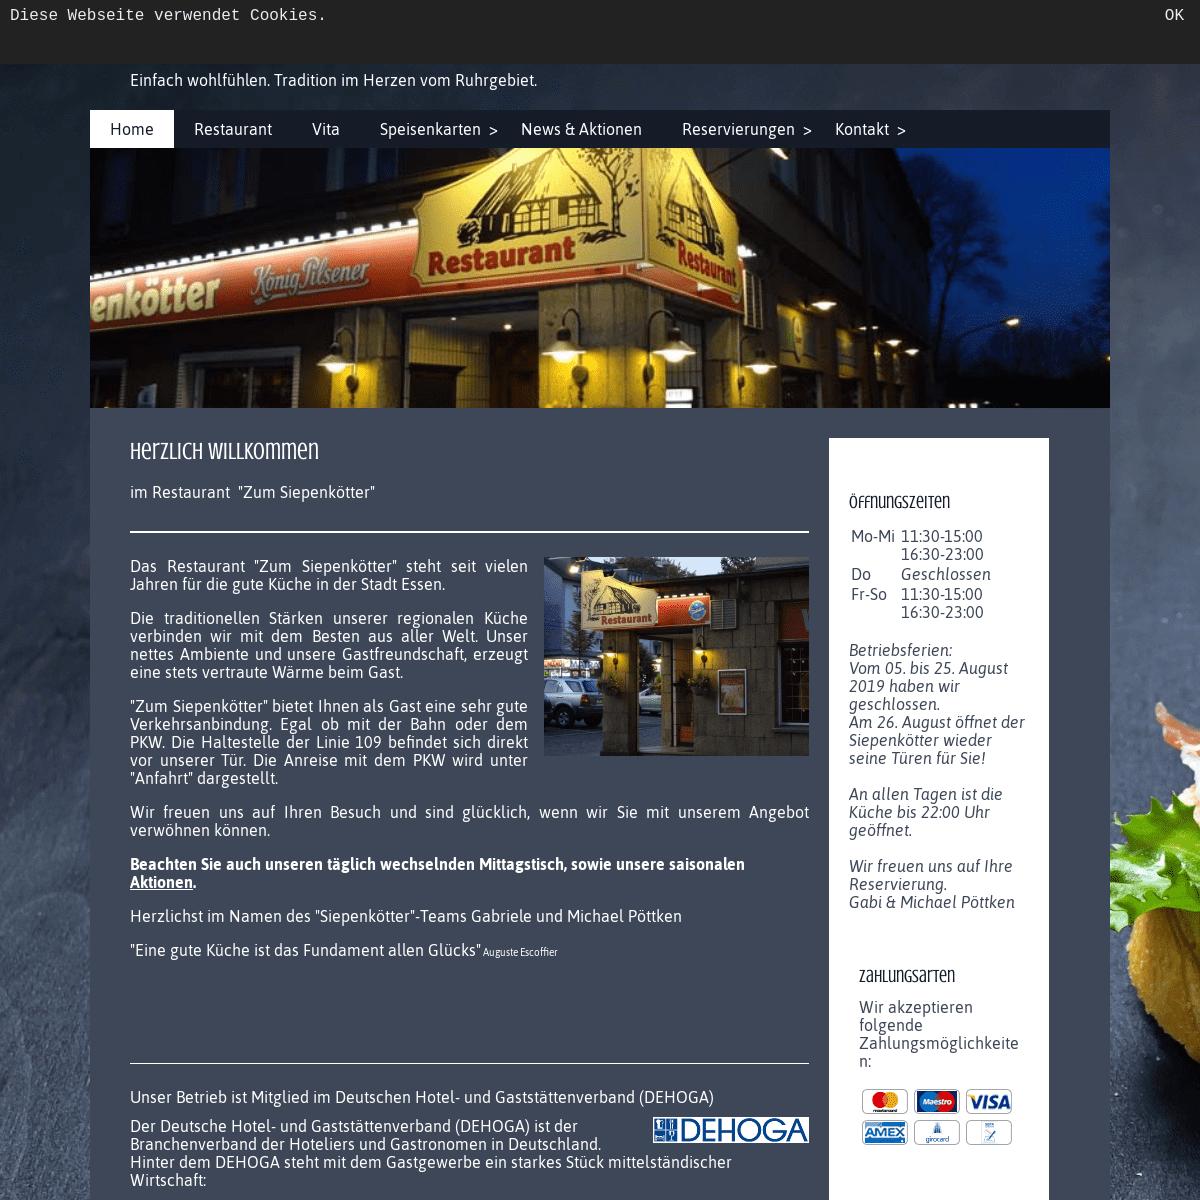 ArchiveBay.com - zumsiepenkoetter.de - Ihr Restaurant -Zum Siepenkötter- in Essen - Home